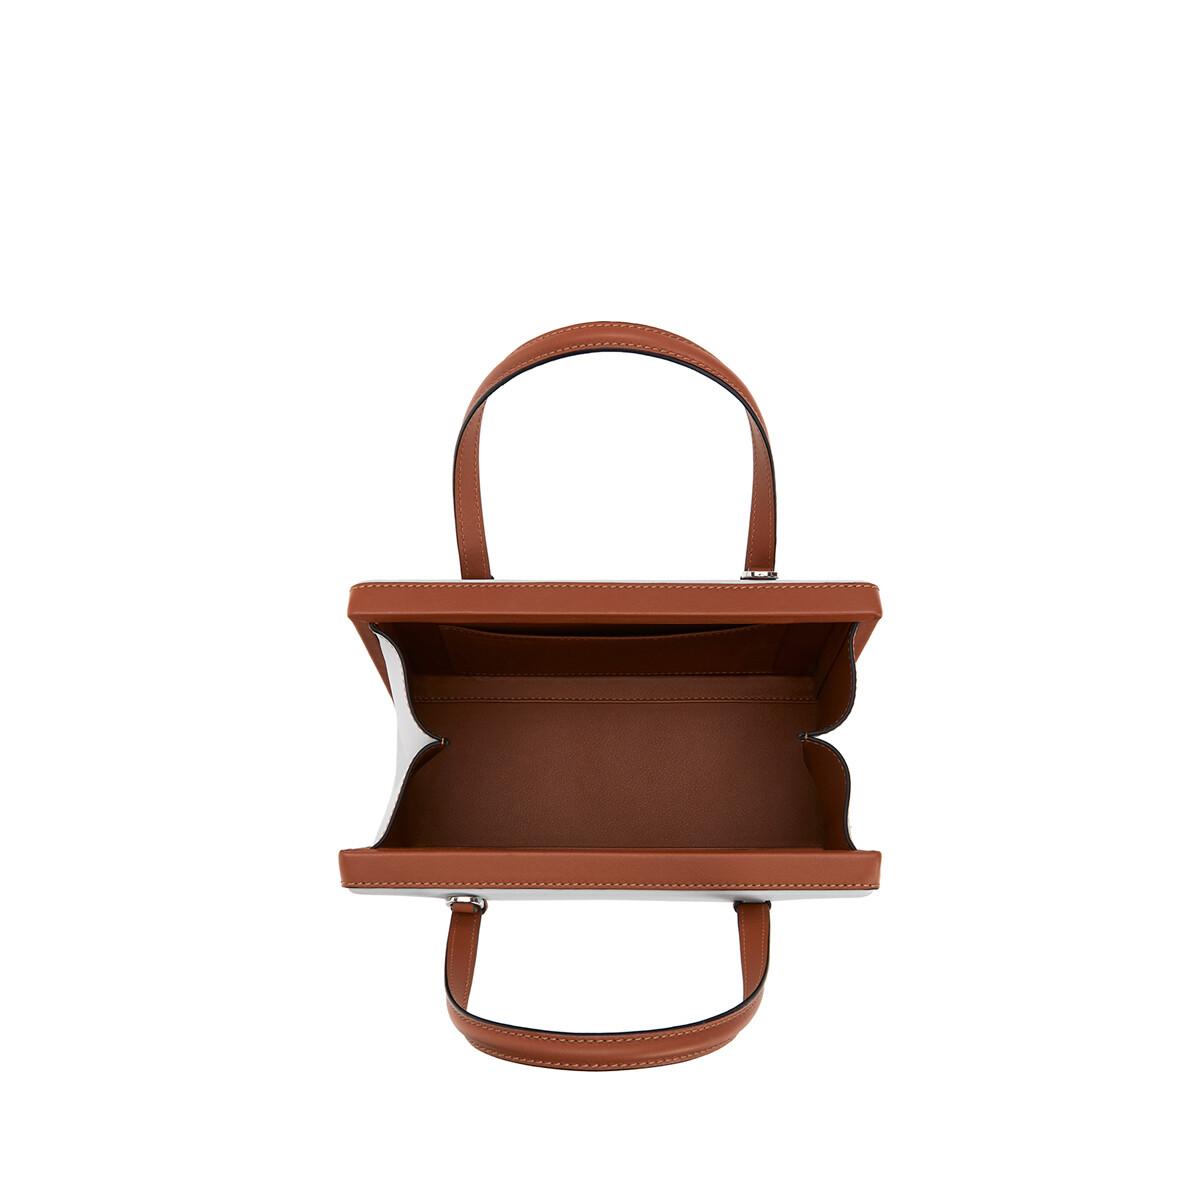 LOEWE Postal手袋 Kaolin/Tan front